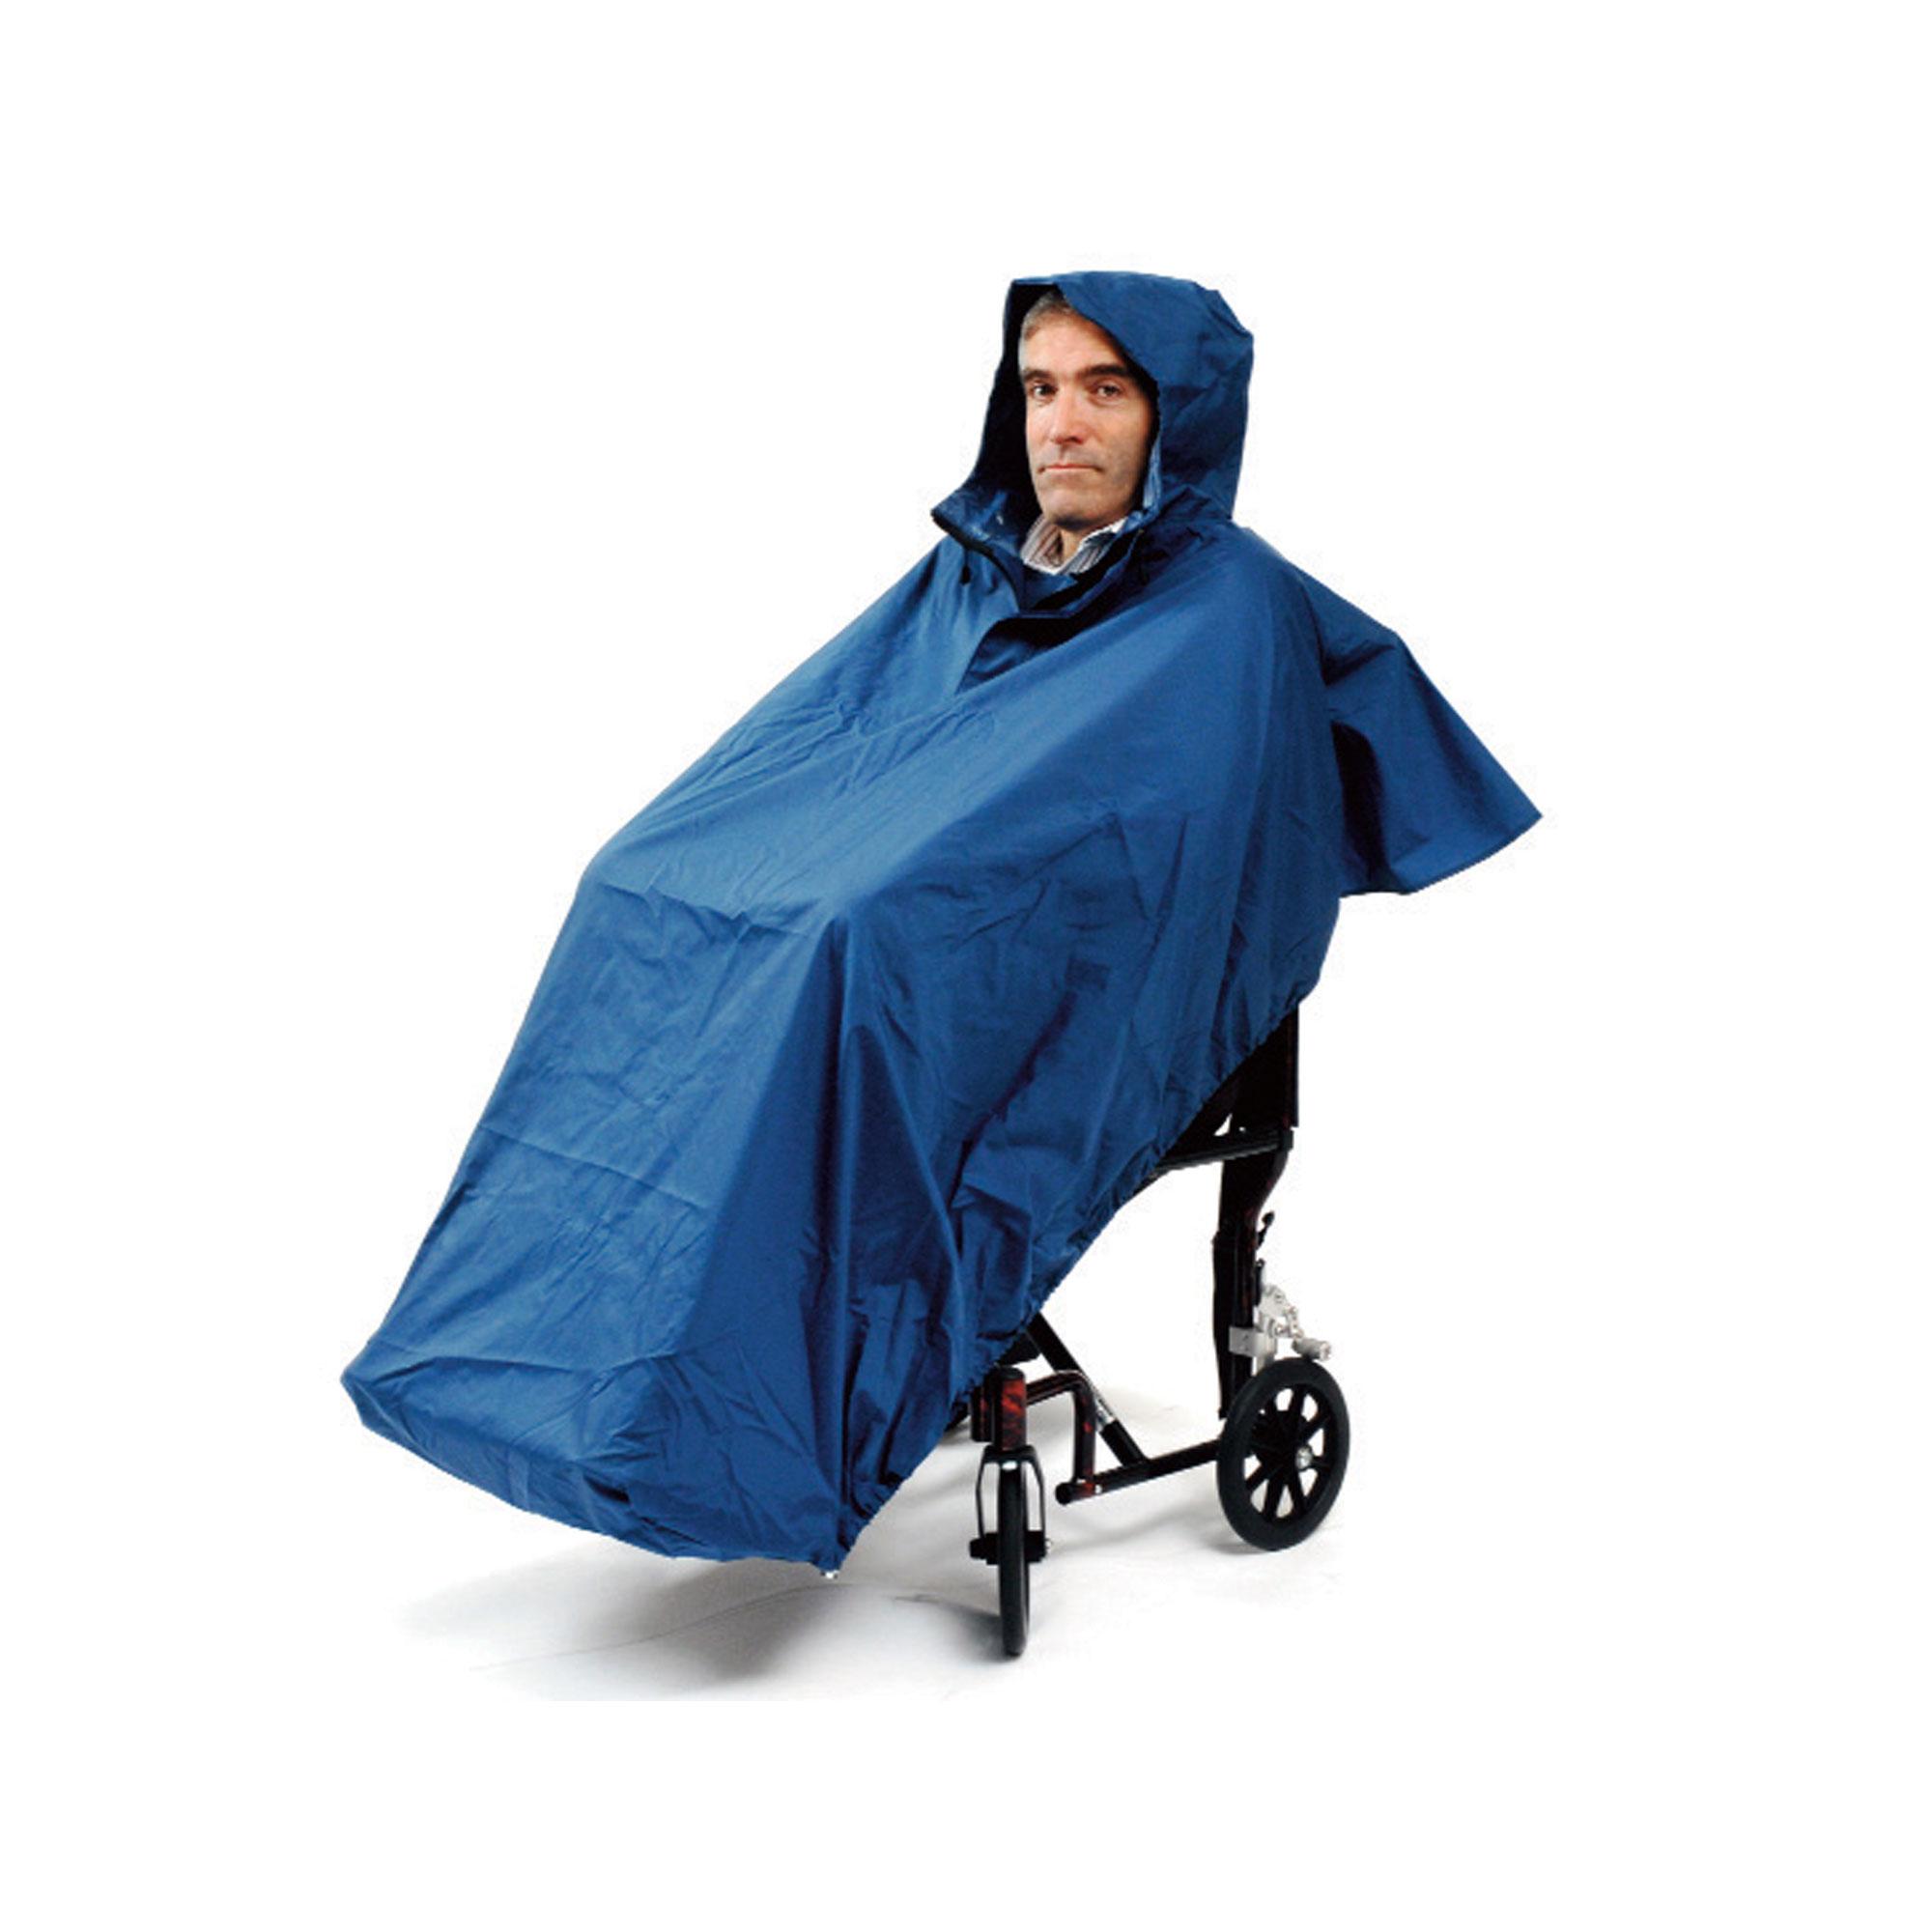 Ac45 Wheelchair Cape Roma Medical